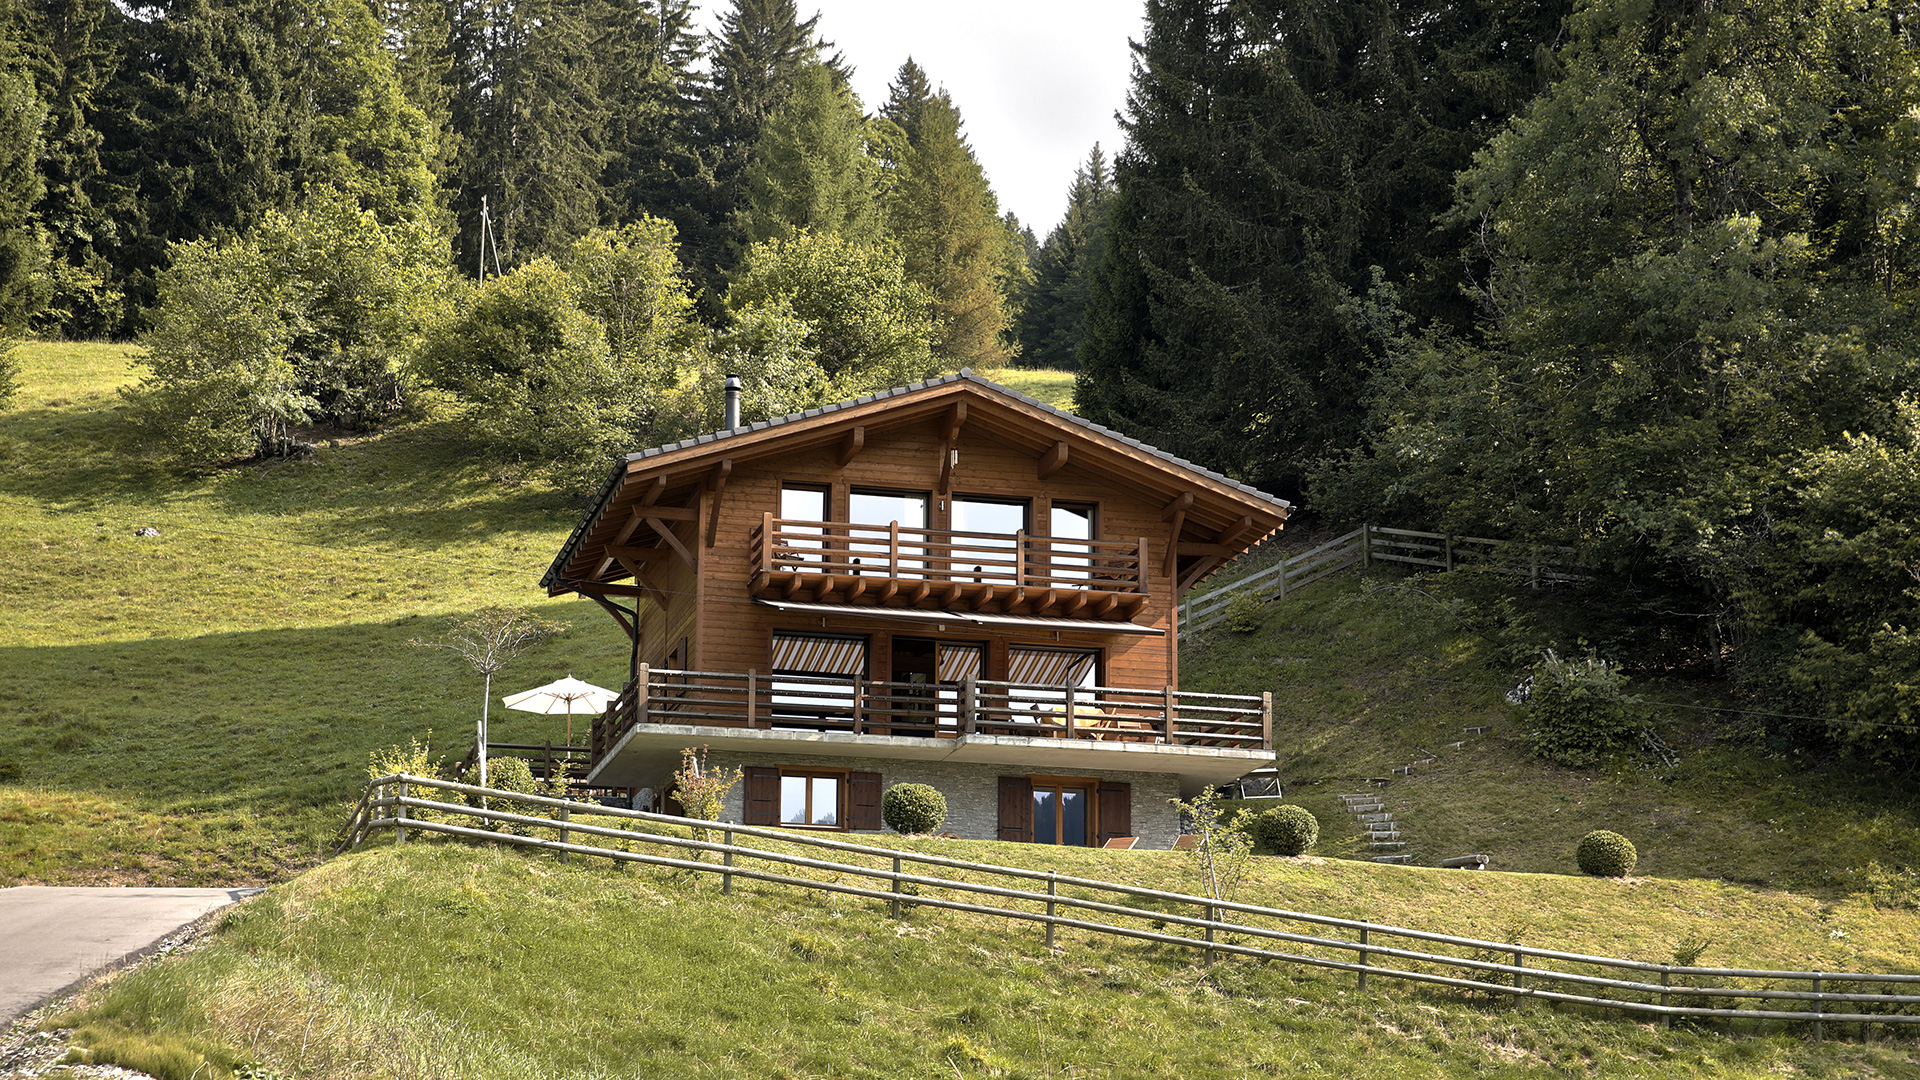 Creme Caramel Chalet, Switzerland